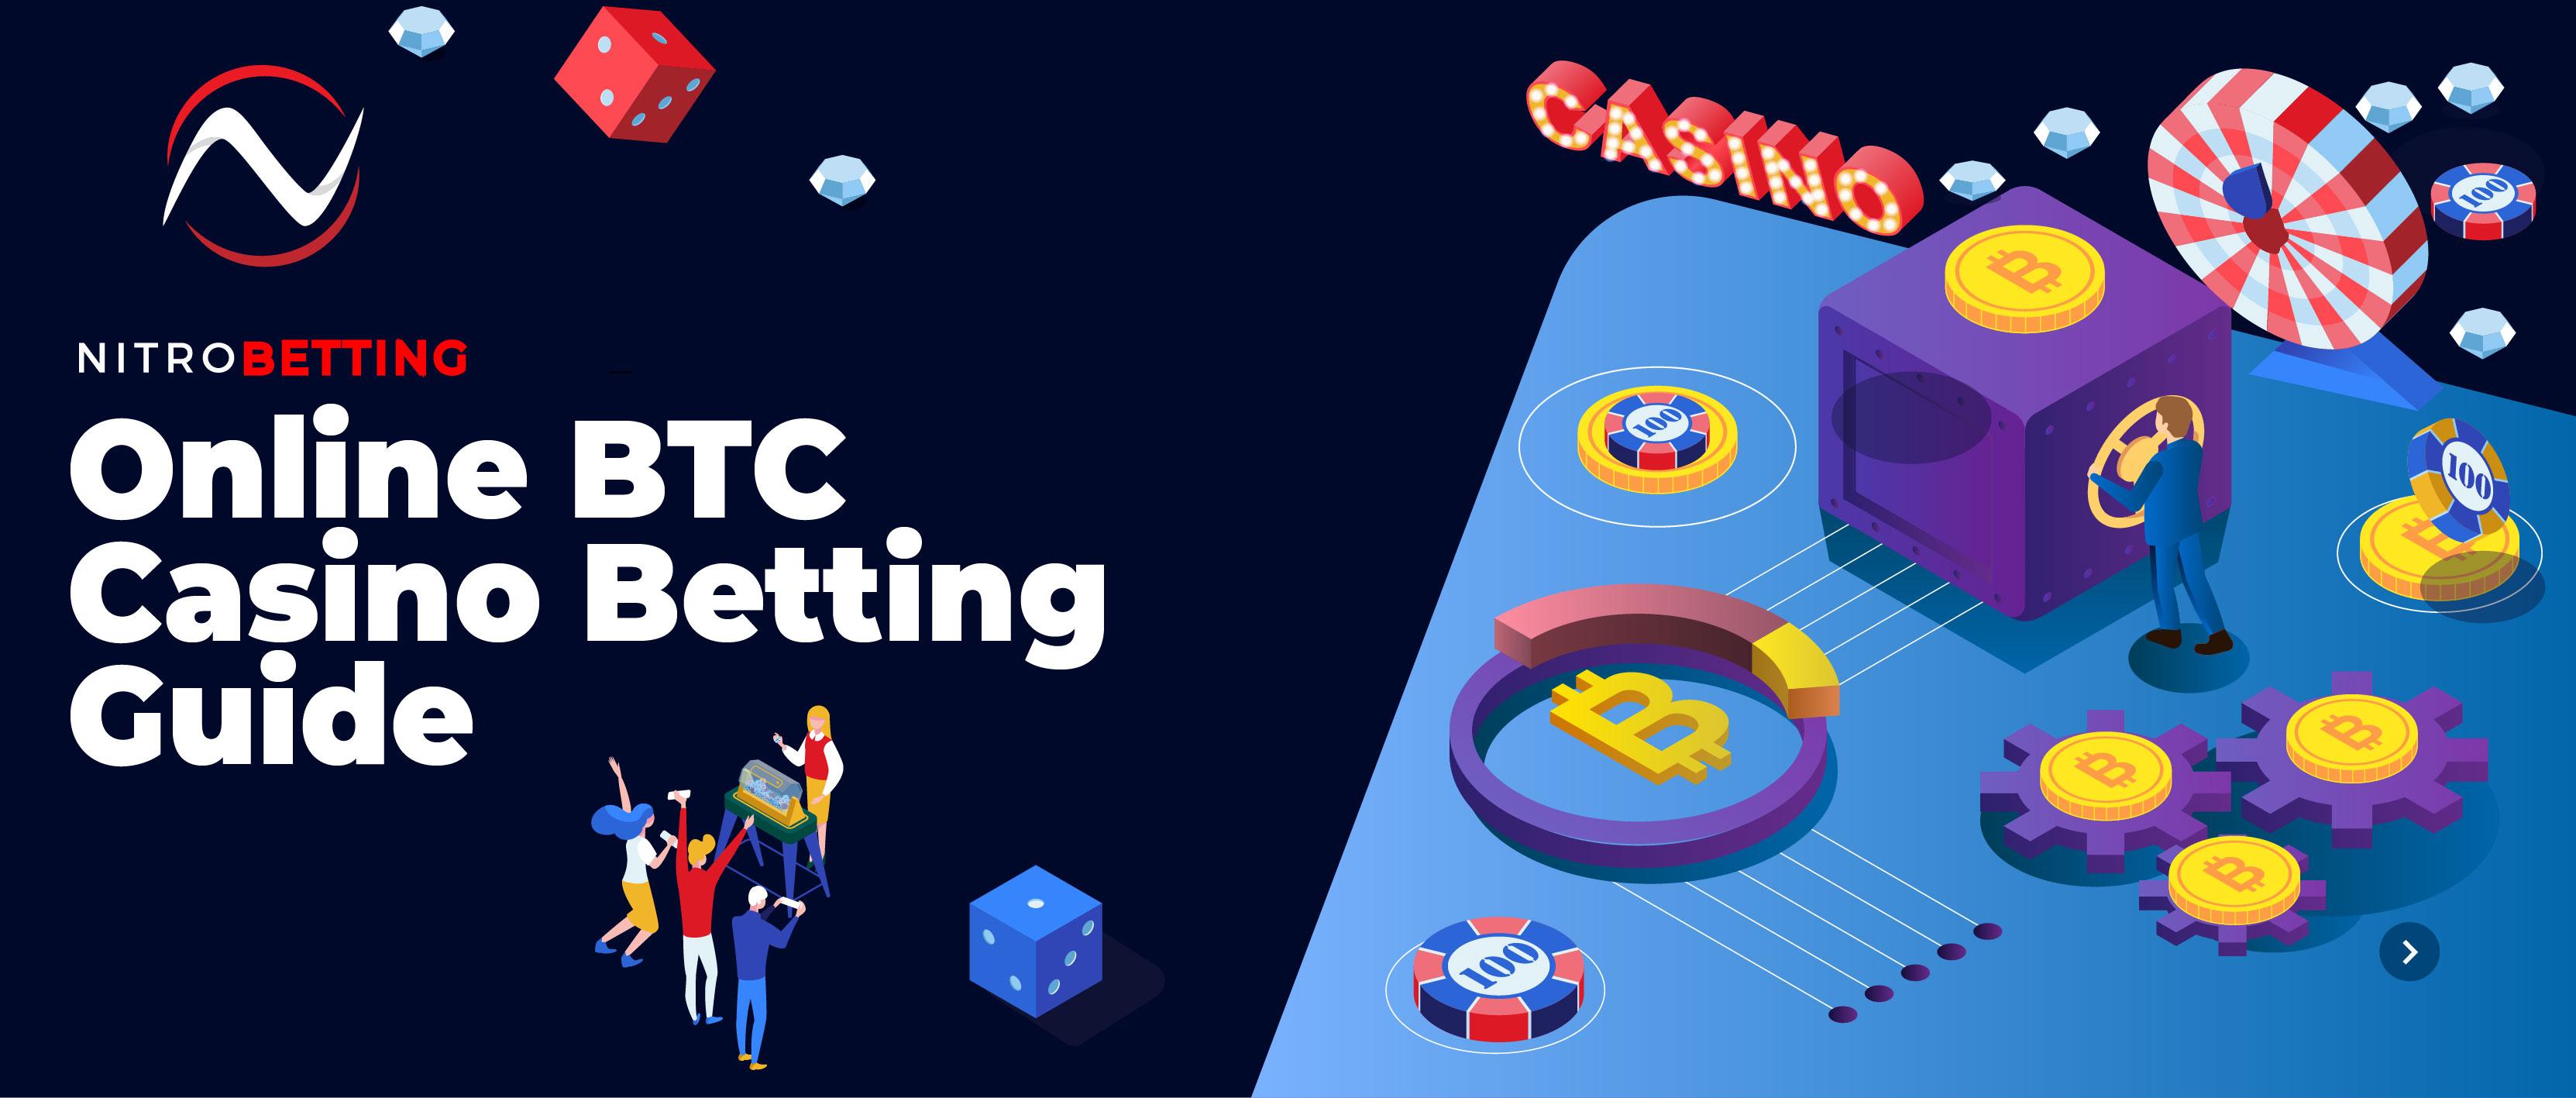 Online Bitcoin Casino Betting Guide